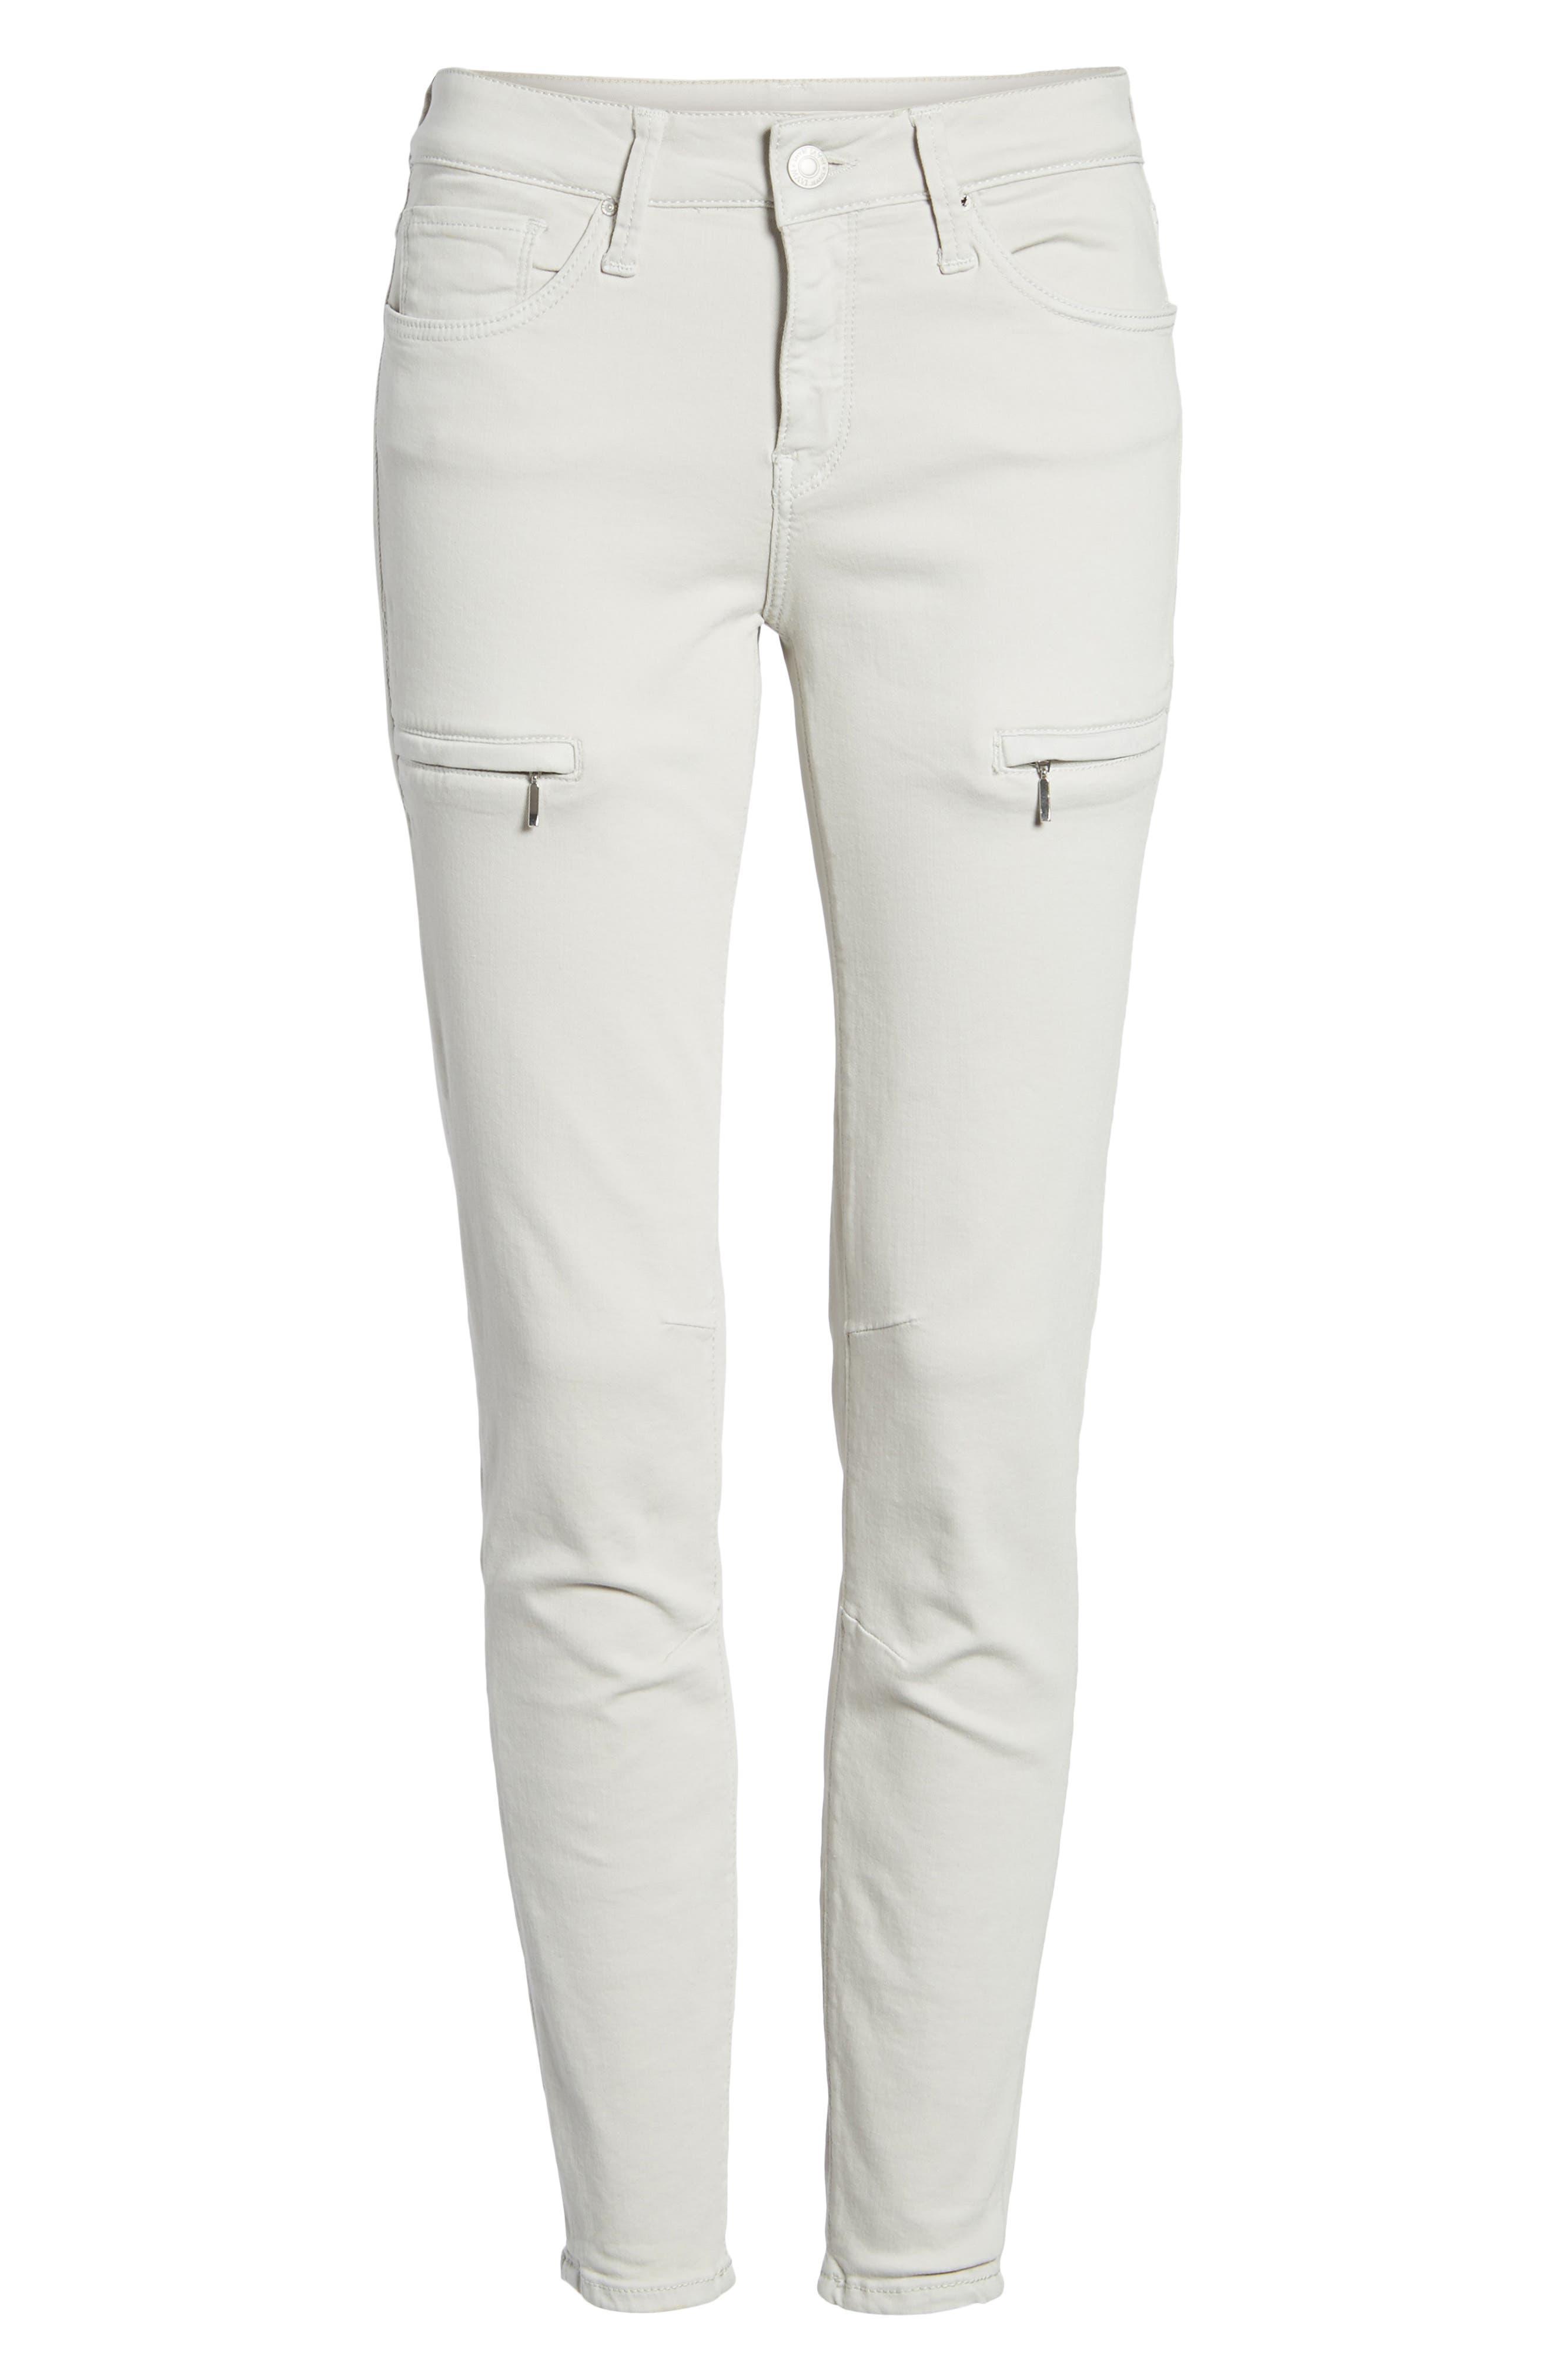 Mavi Karlina Skinny Cargo Pants,                             Alternate thumbnail 7, color,                             Glacier Grey Twill